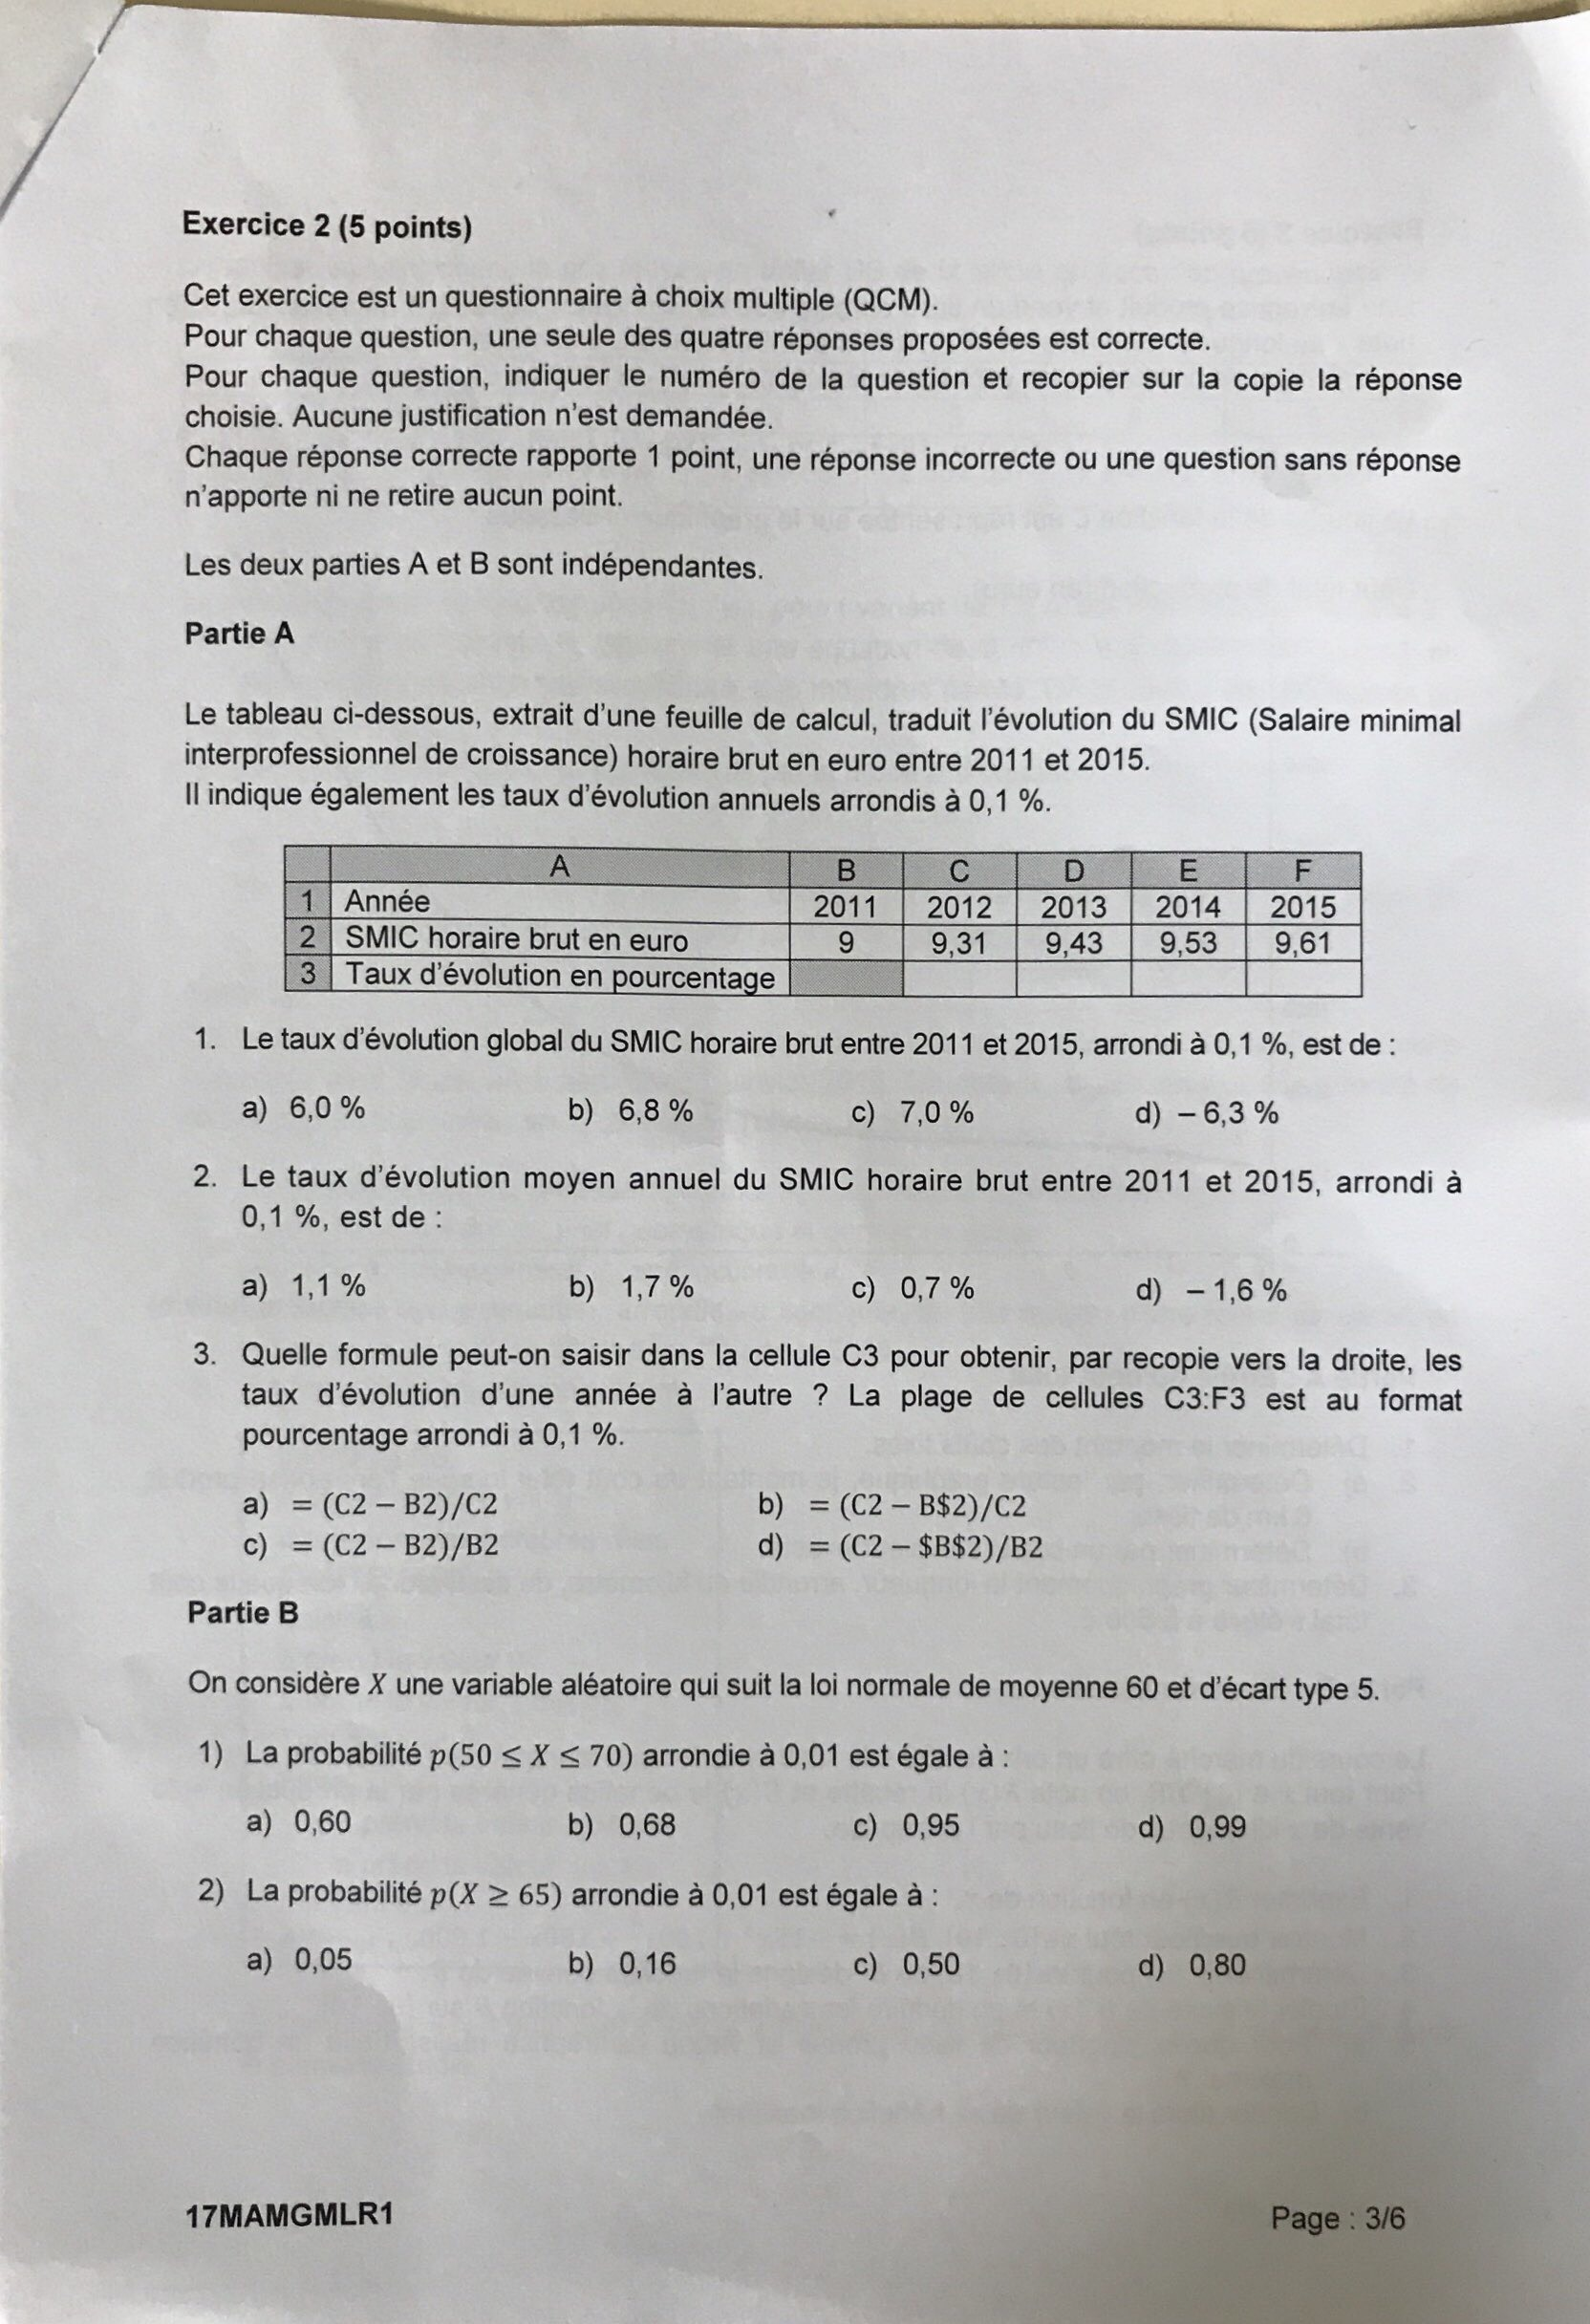 exercice-2-maths-stmg-bac-2017